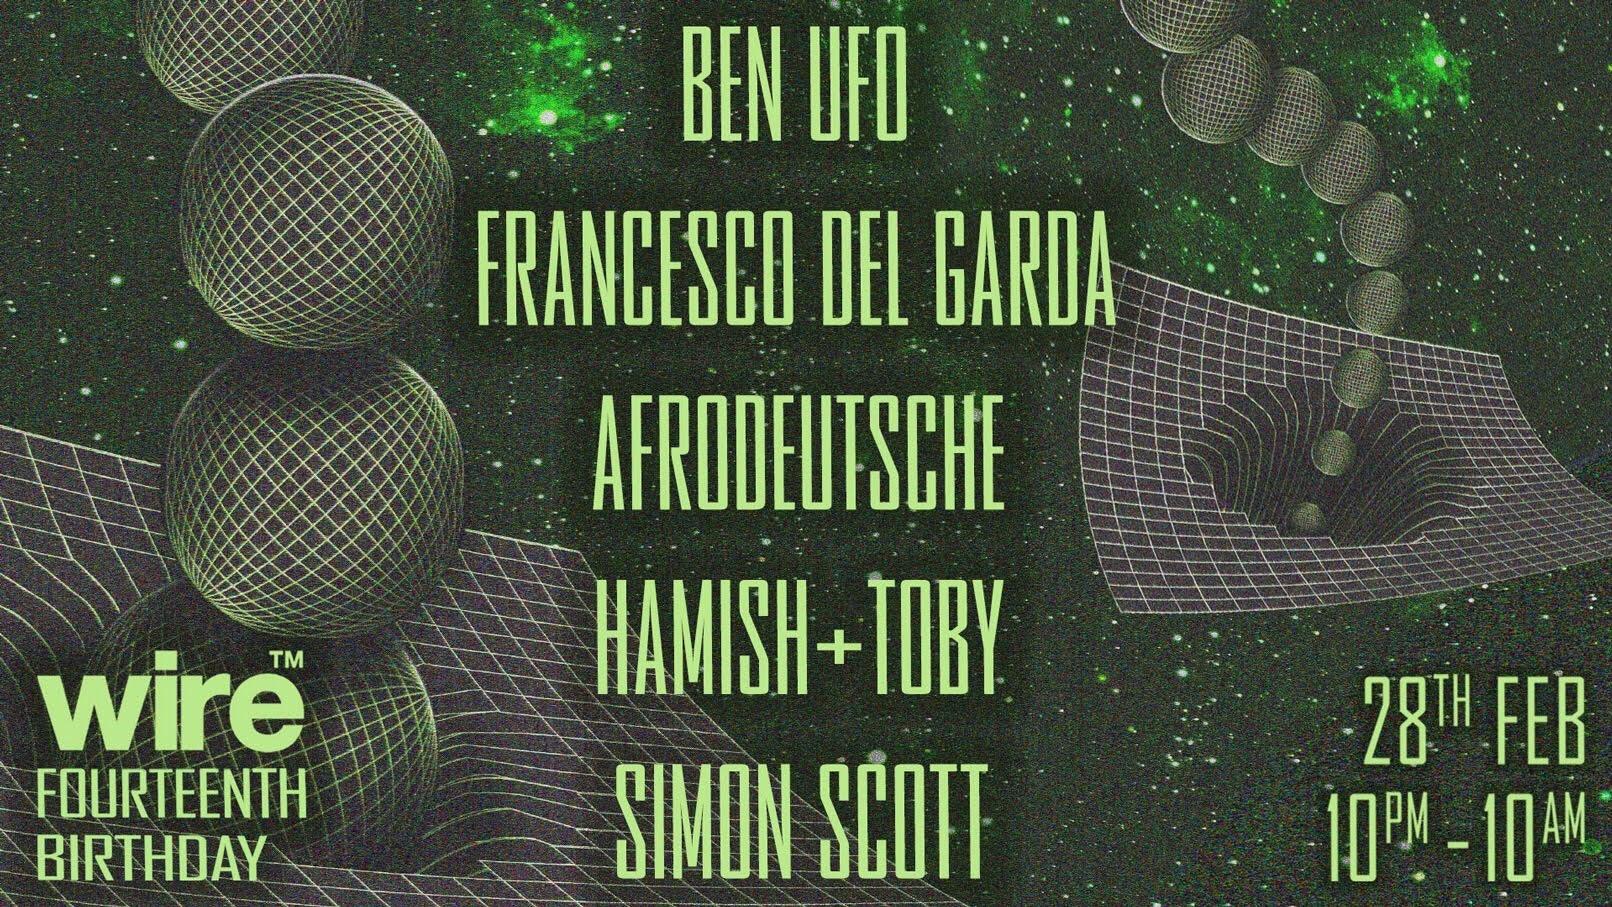 Wire's 14th Birthday: Ben UFO, Francesco Del Garda + more